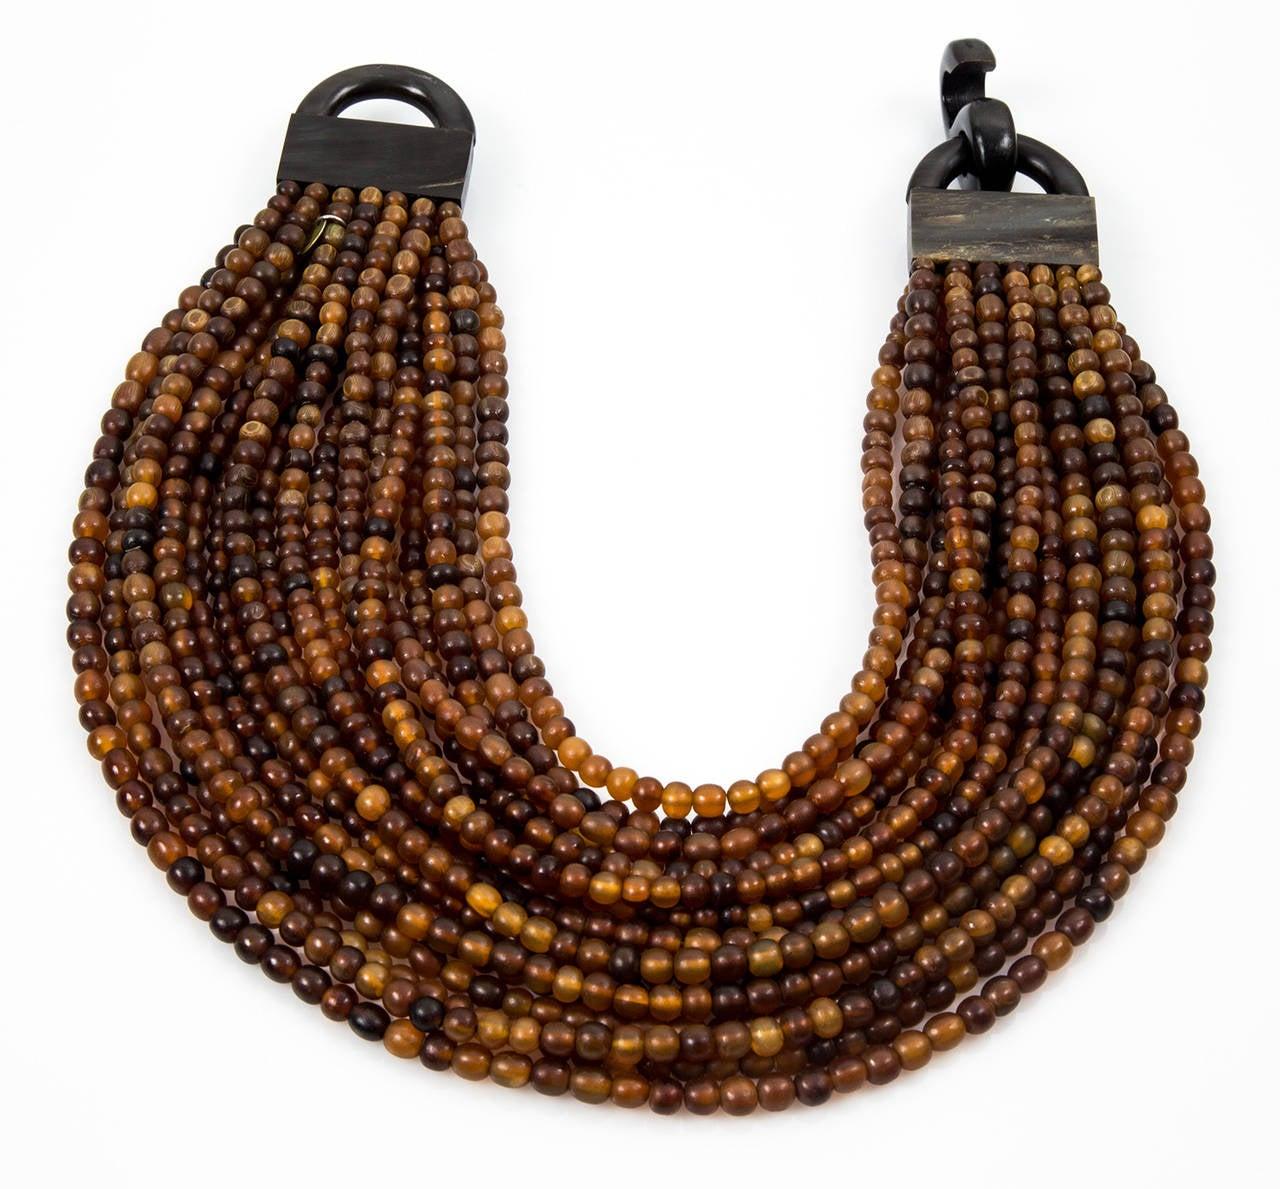 Gerda Lynggaard for Monies Multi Strand Horn Necklace and Earrings 3